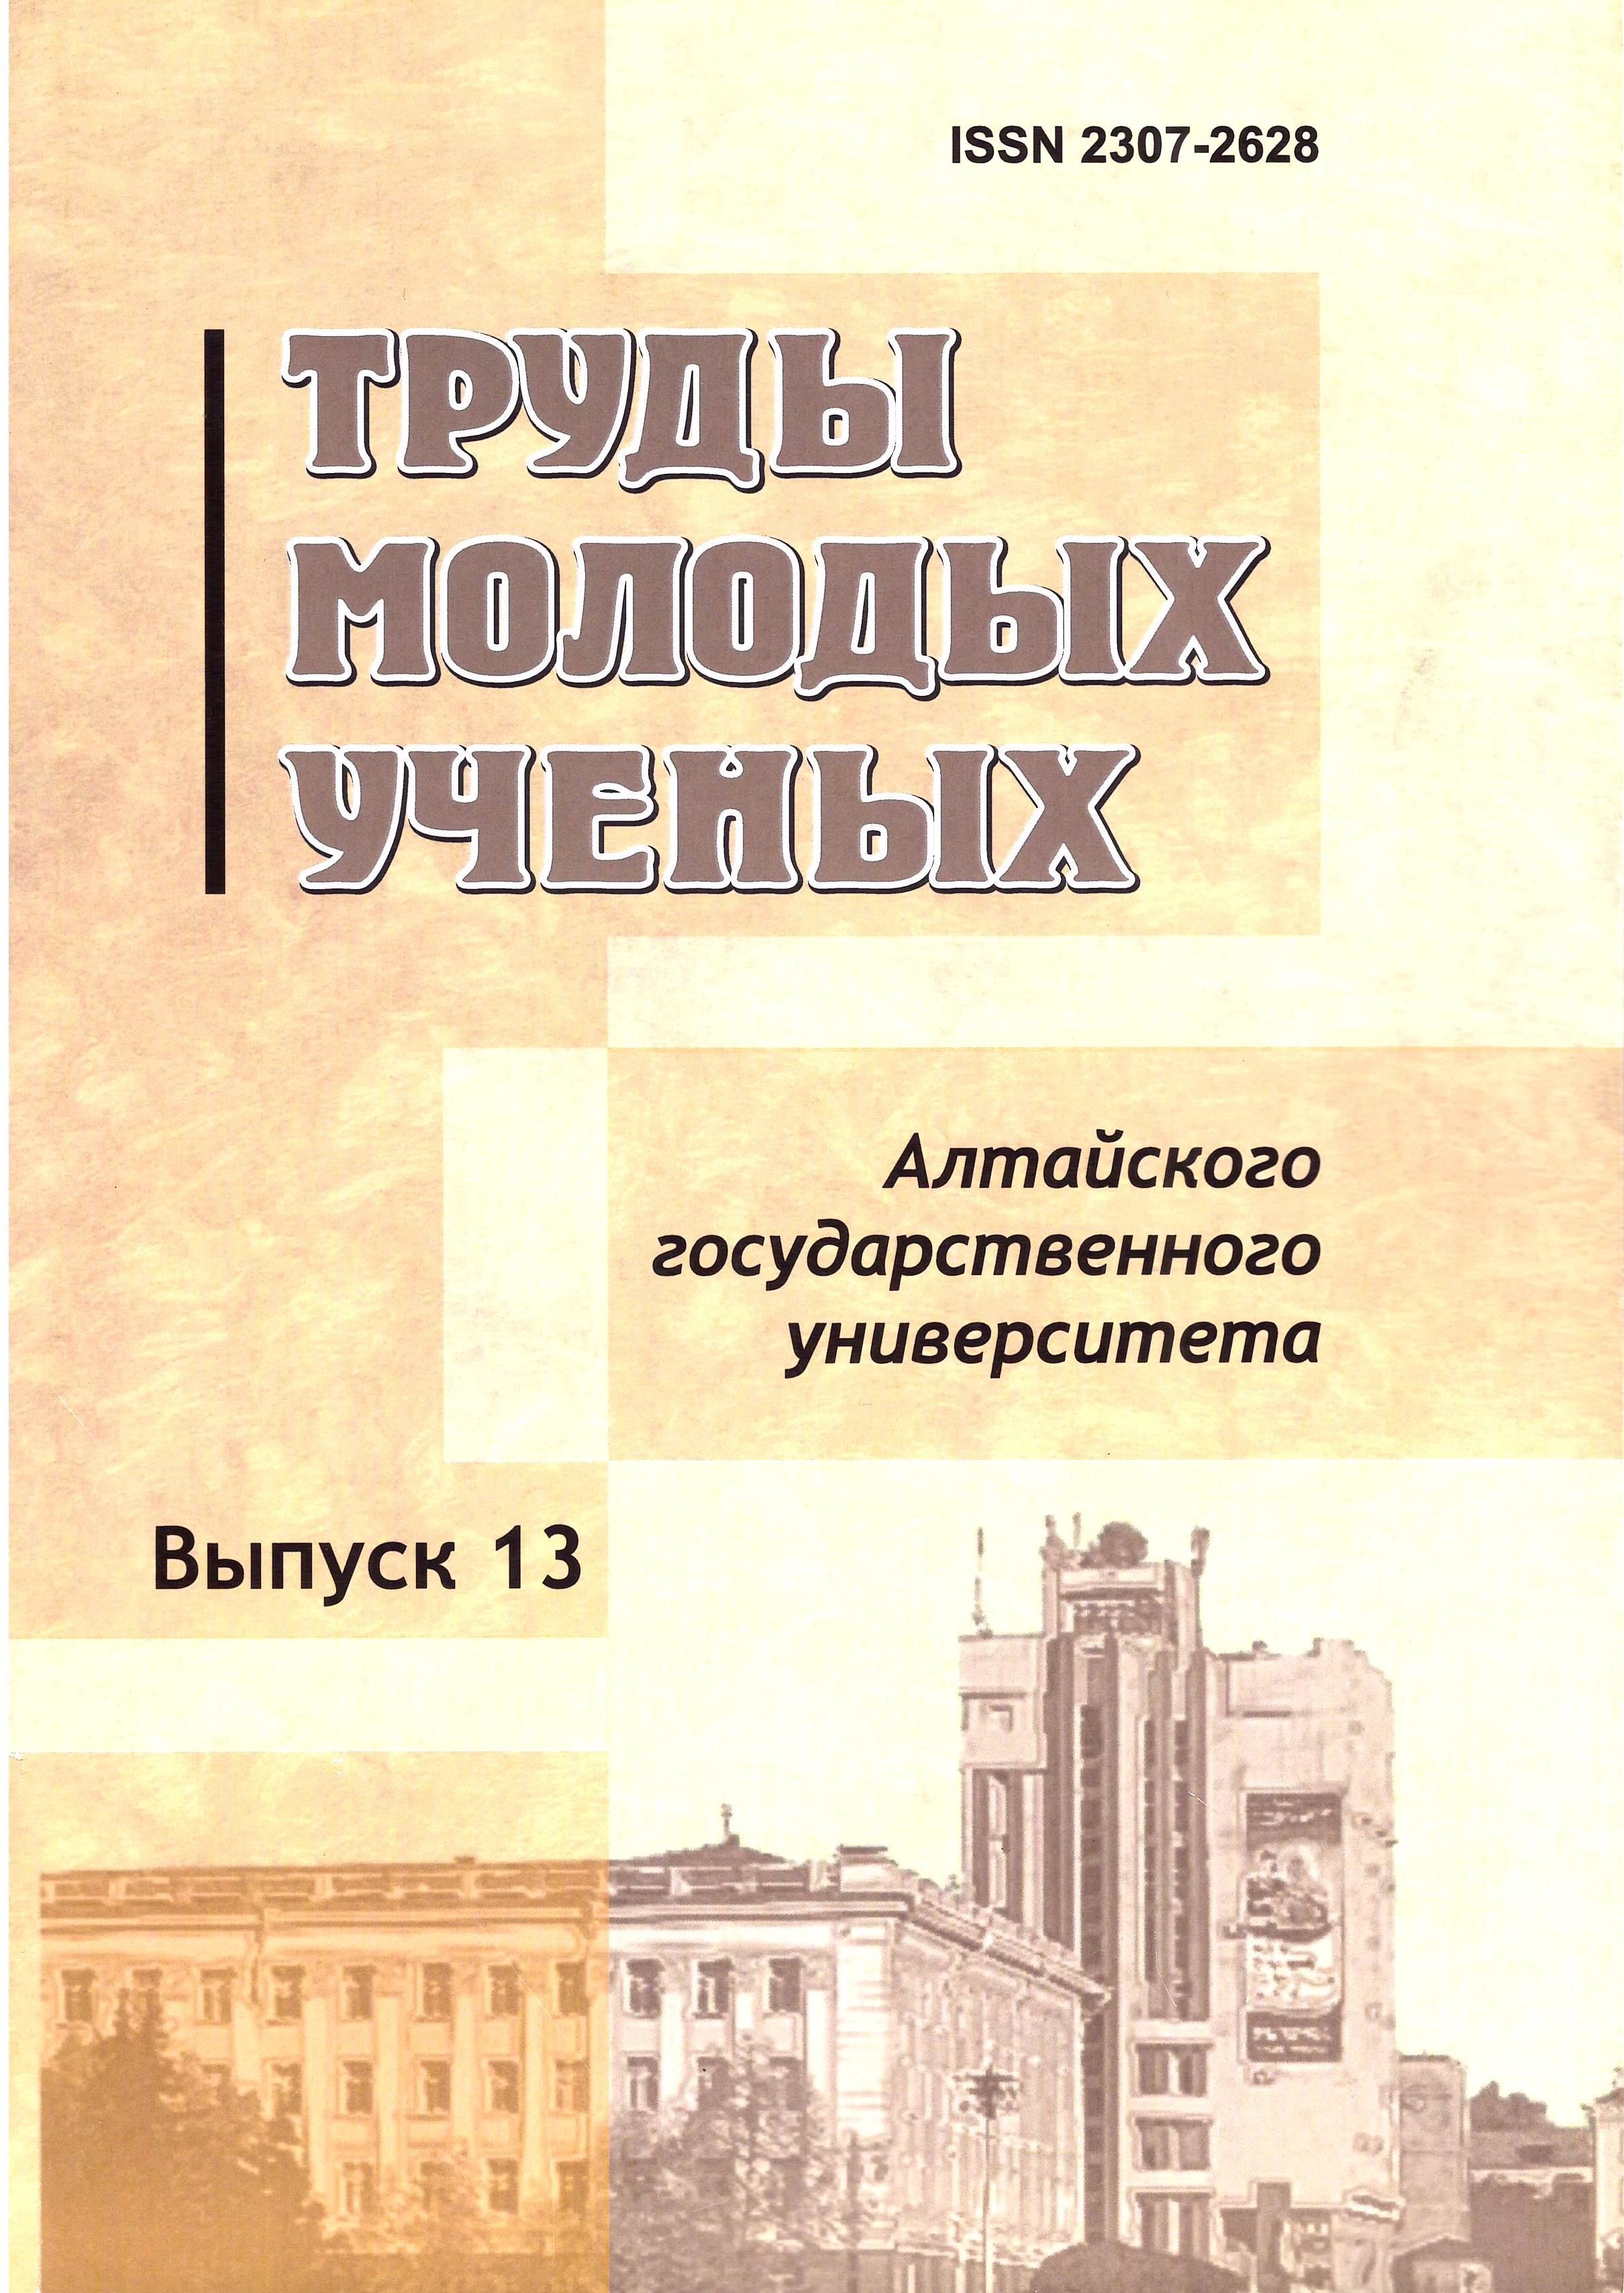 Труды молодых ученых выпуск 13